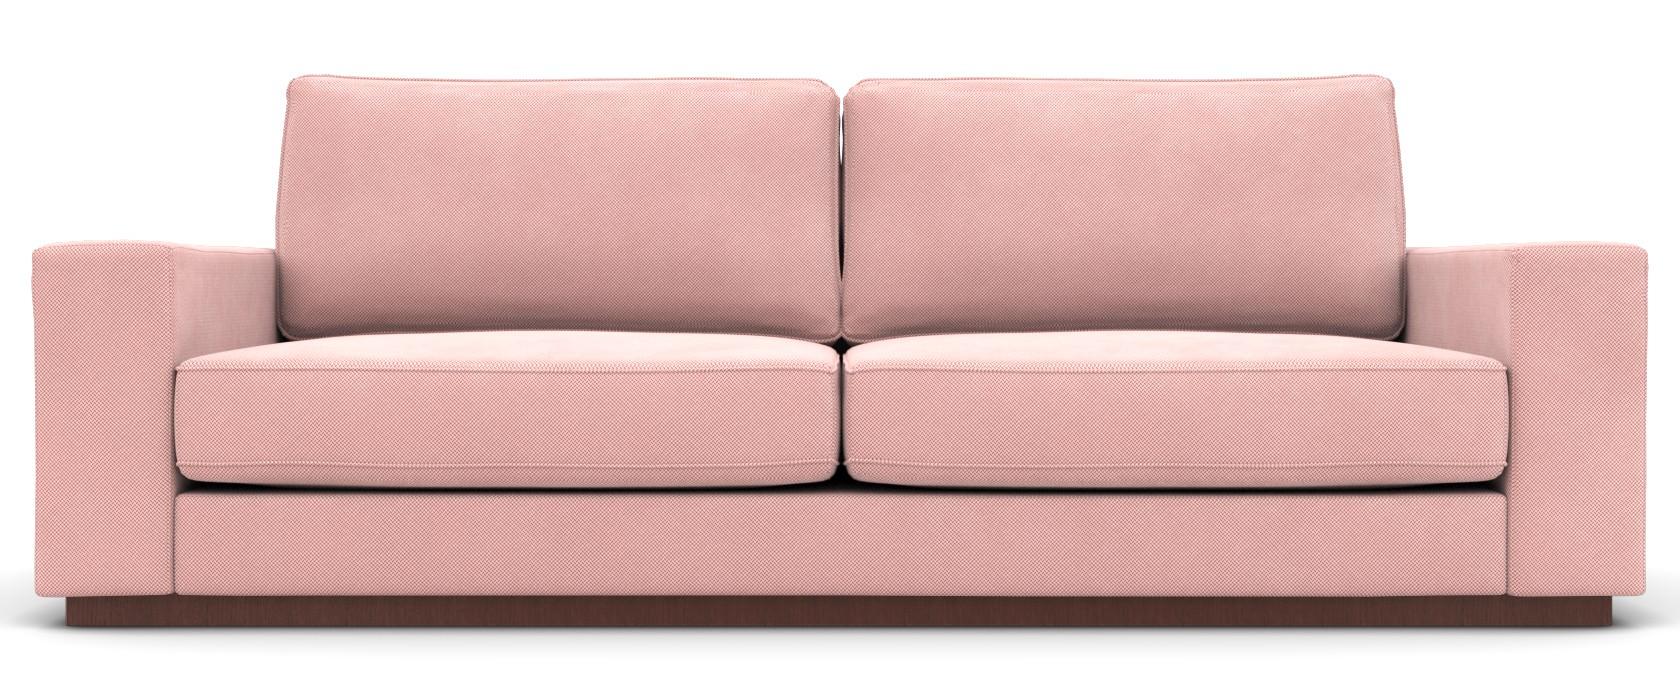 3-Sitzer Sofa Milano Lounge